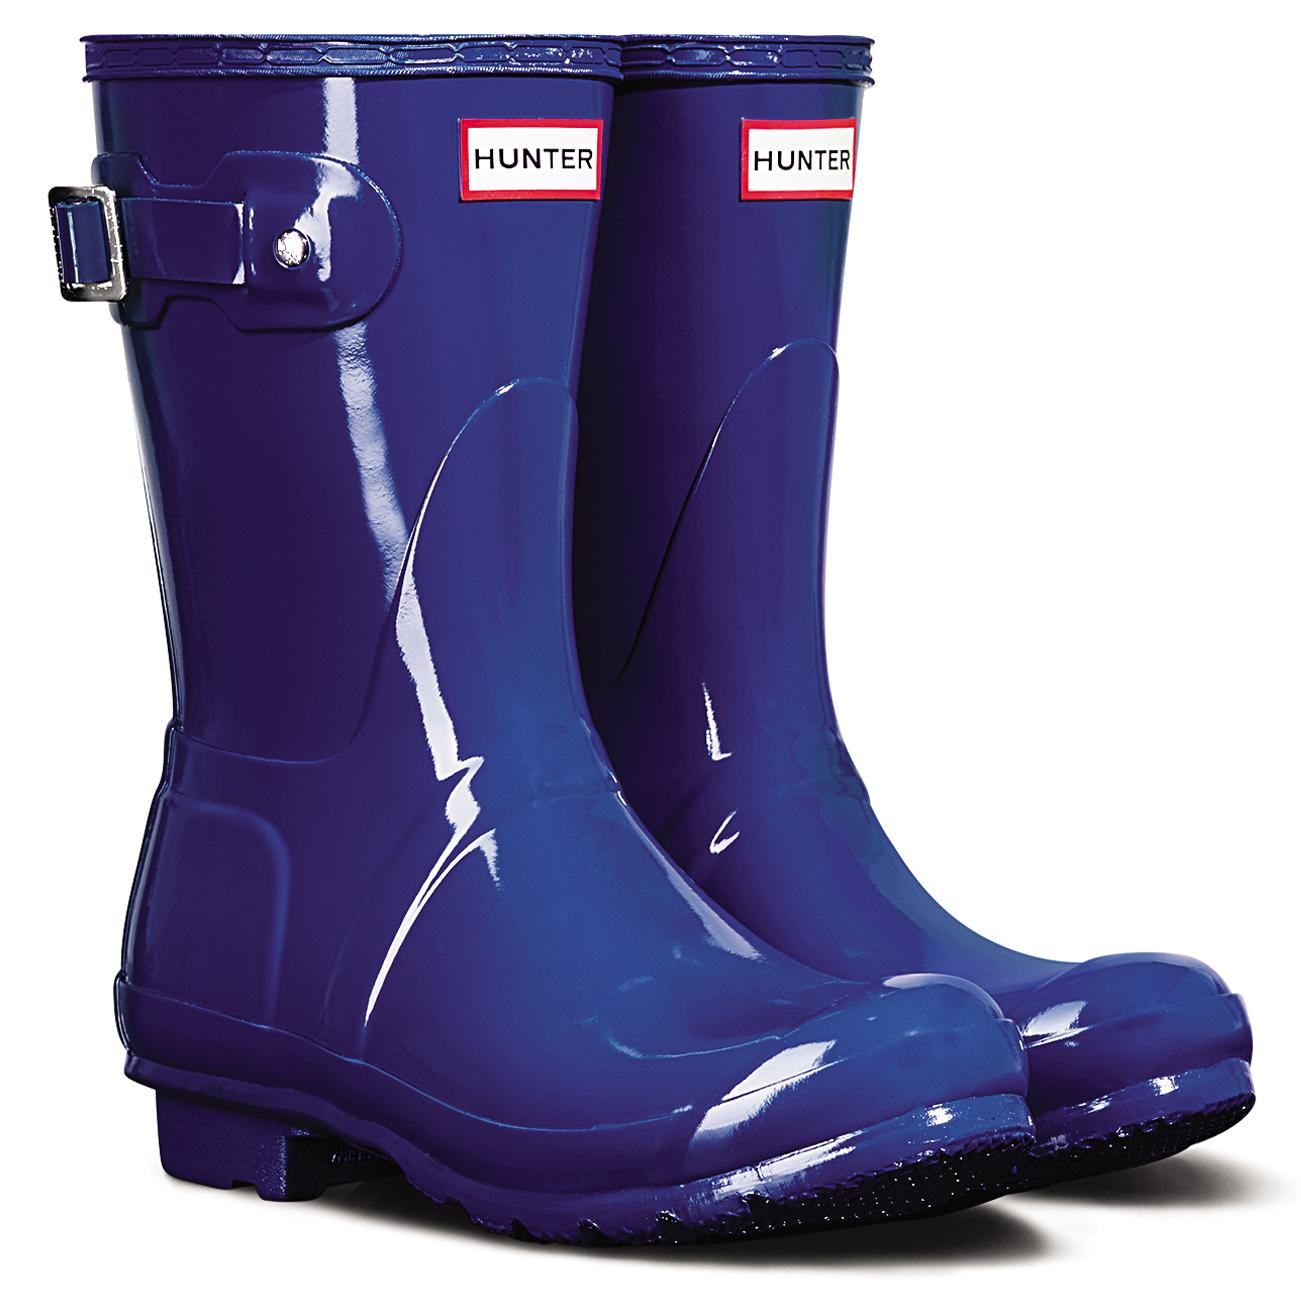 Donna Hunter Original Short Rain Gloss Wellingtons Snow Winter Rain Short Boots US 5-11 213b20